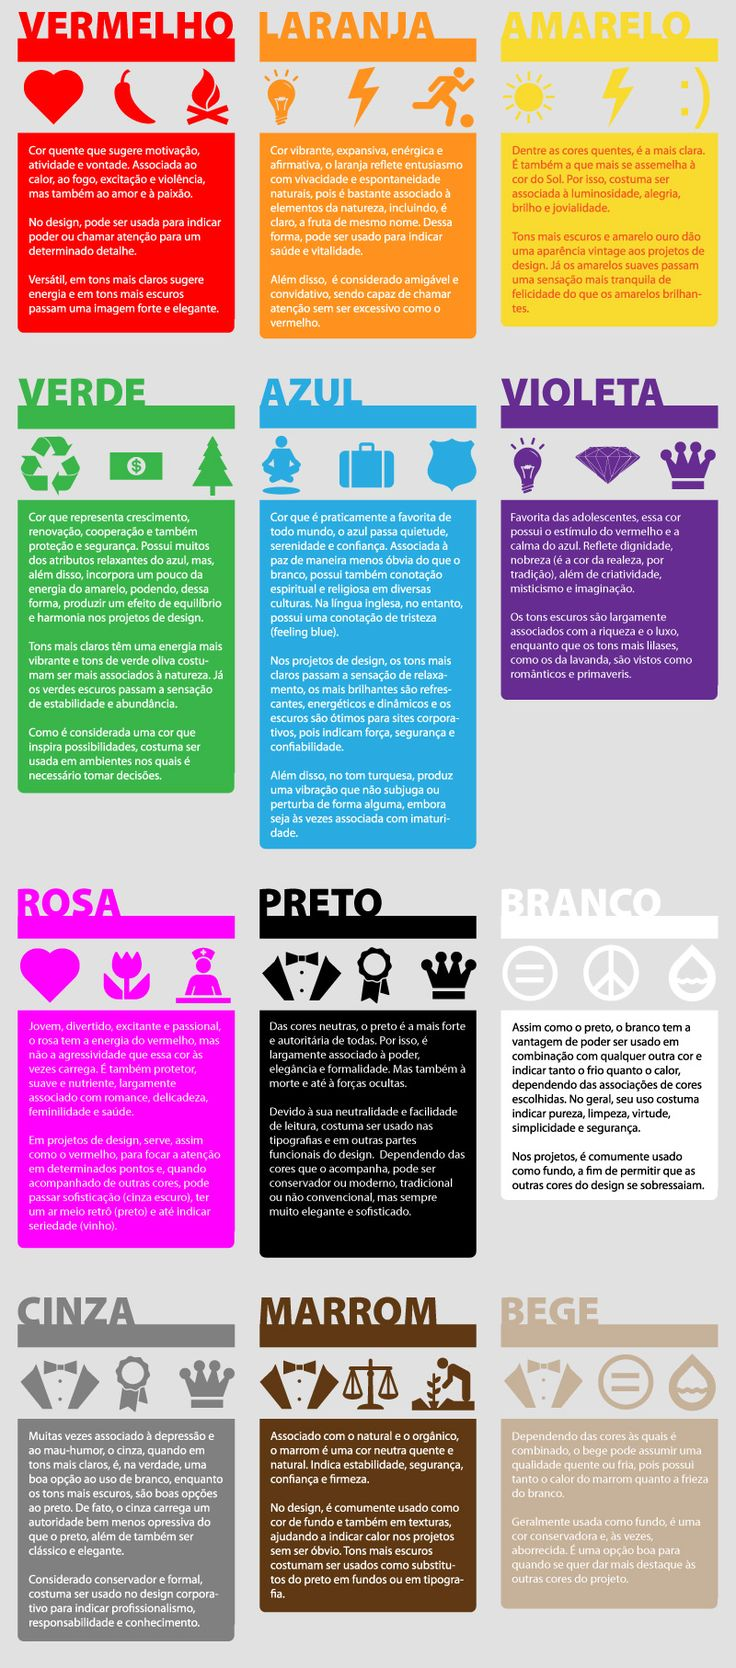 A psicologia das cores no design | Blog SeuLogo.Net - via http://bit.ly/epinner